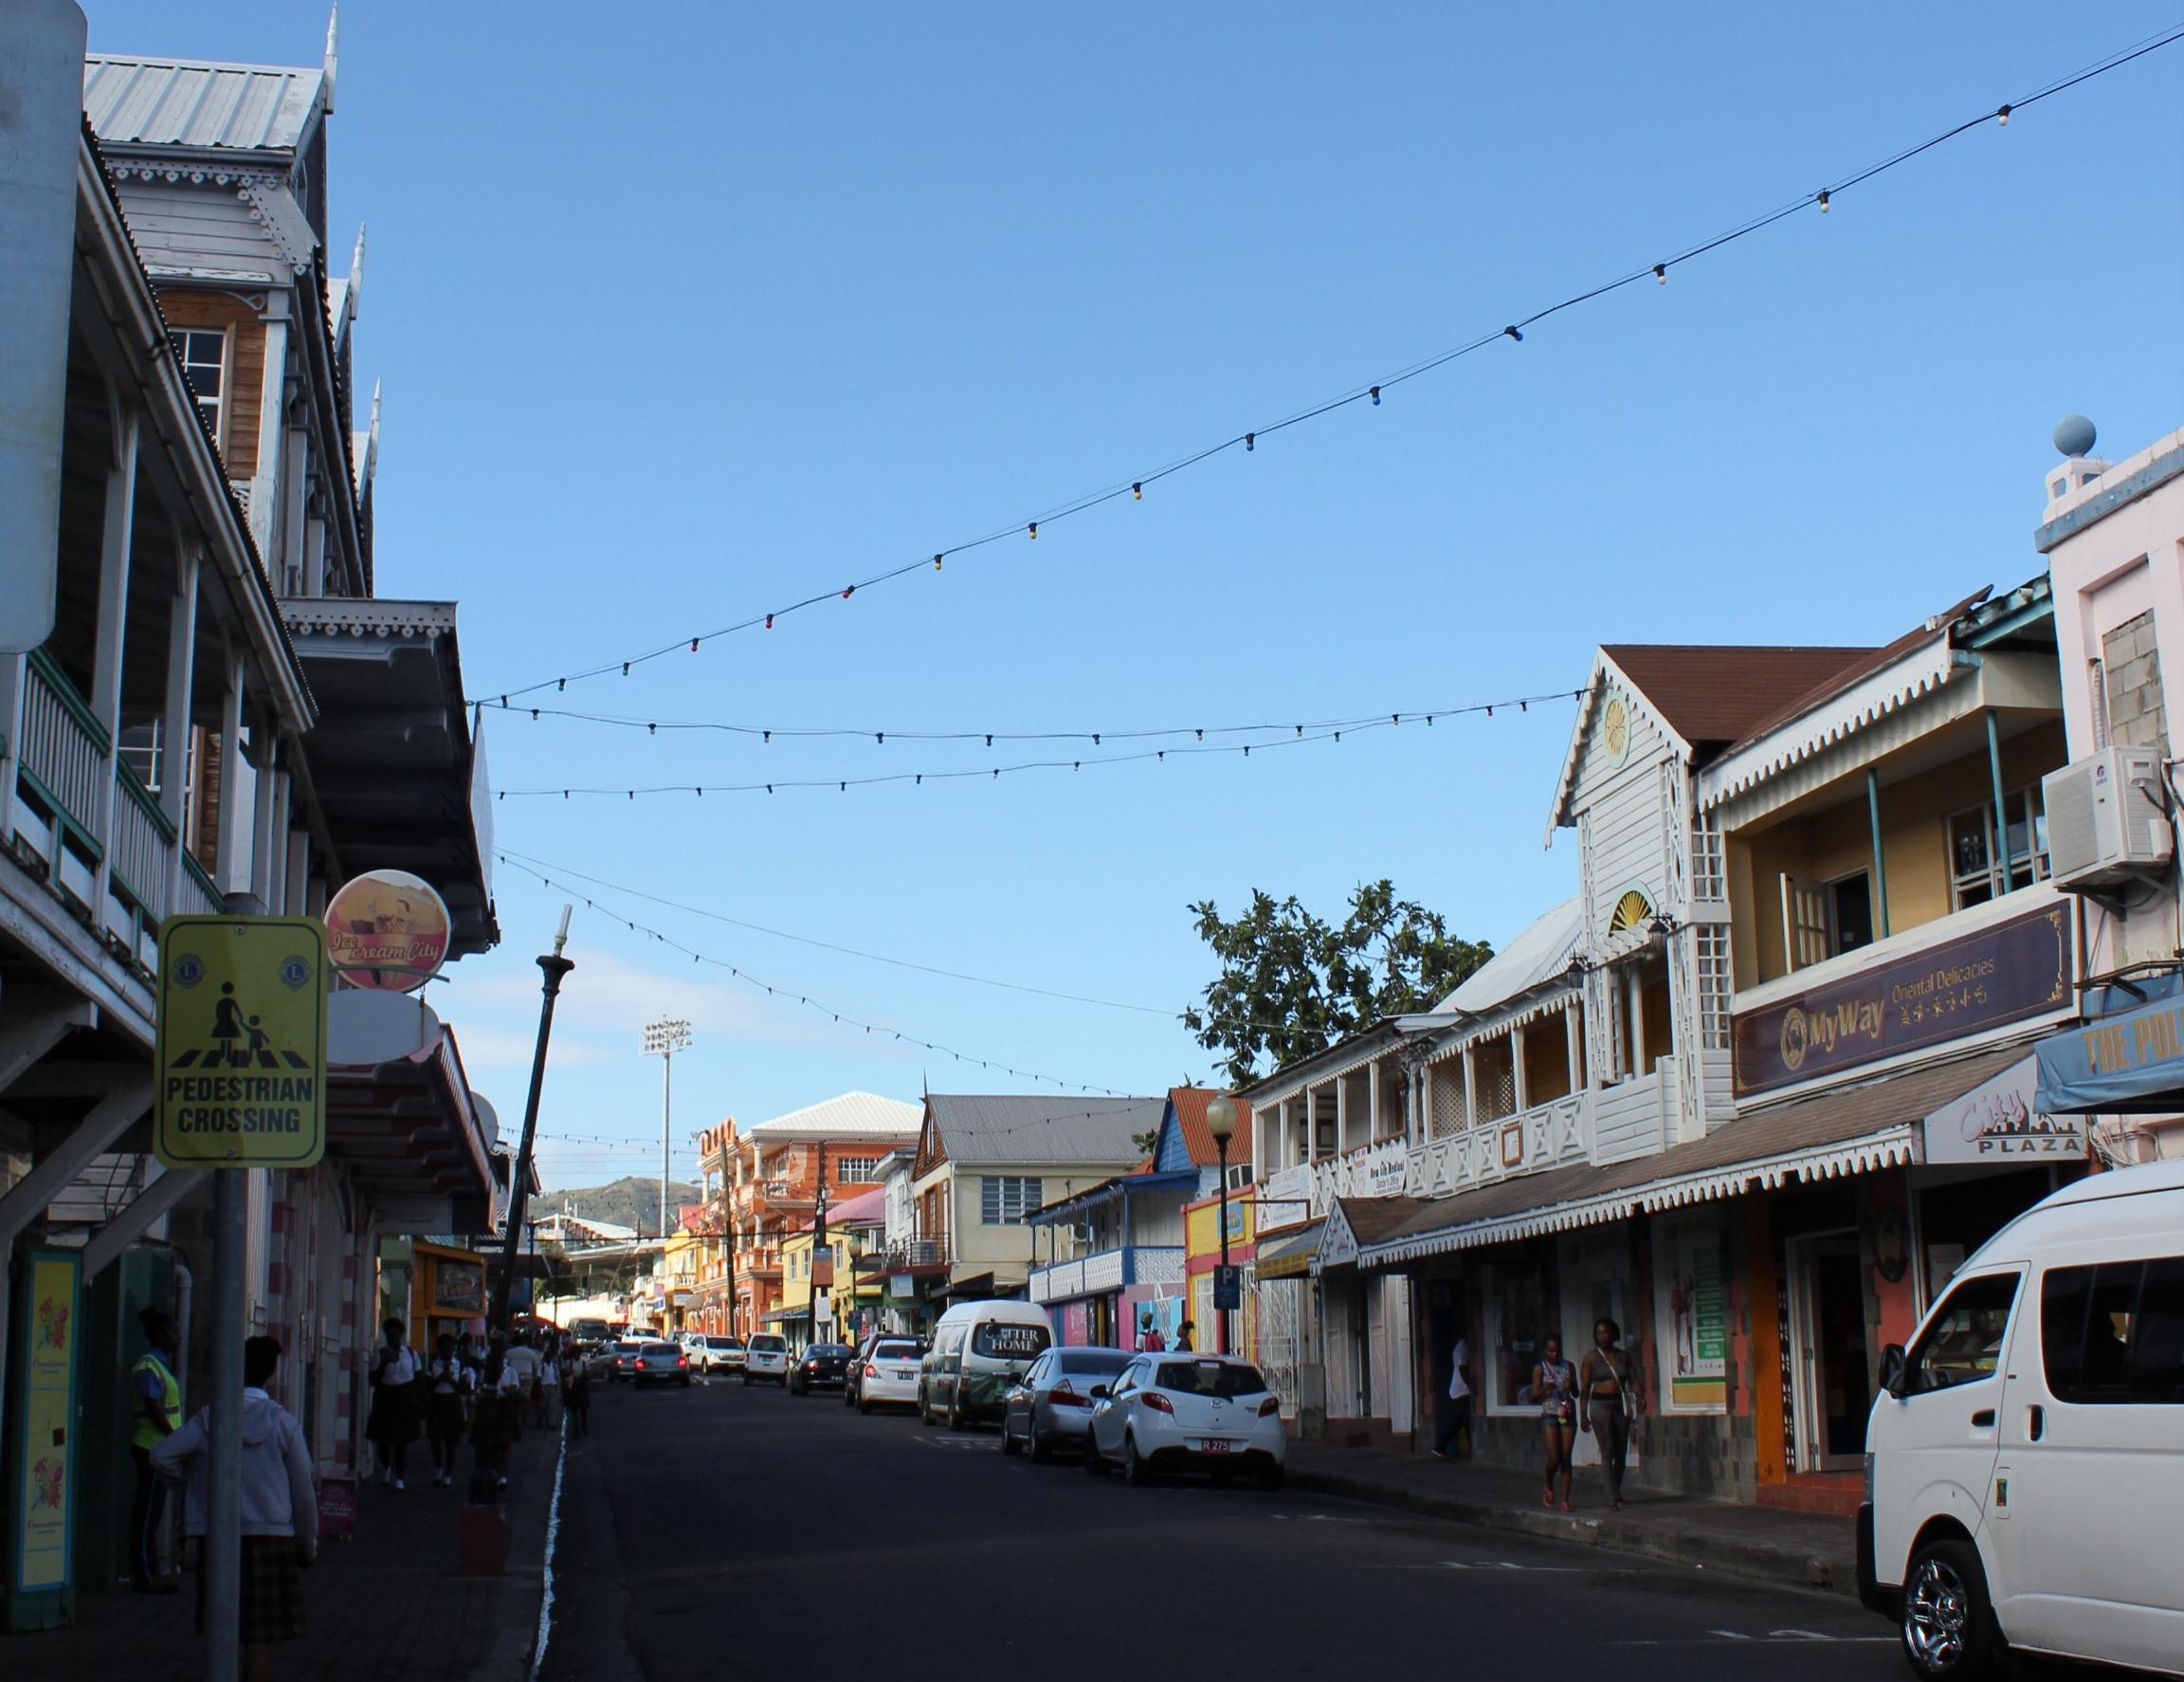 Downtown Basseterre – Main street